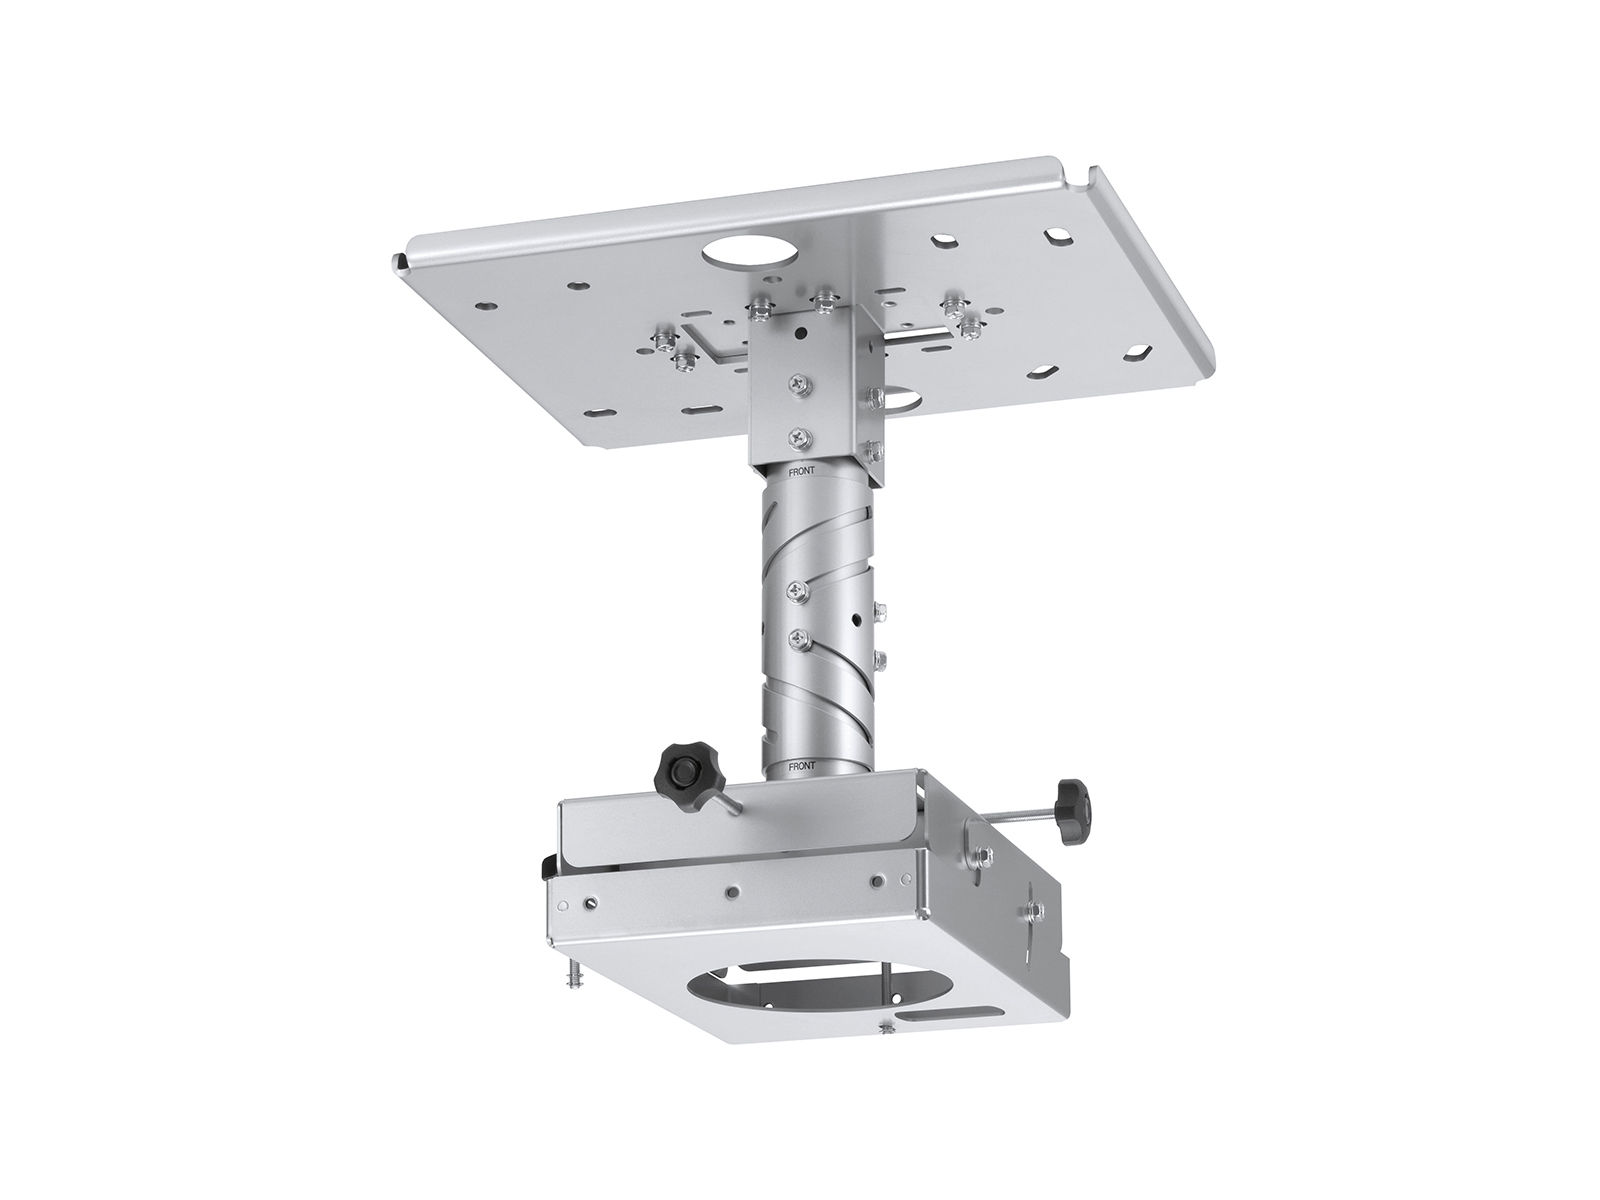 Panasonic ET-PKD130H | Deckenhalterung, lang, PT-RW630/RZ670/DW830/DX100/, DZ870 mit ET-DLE030